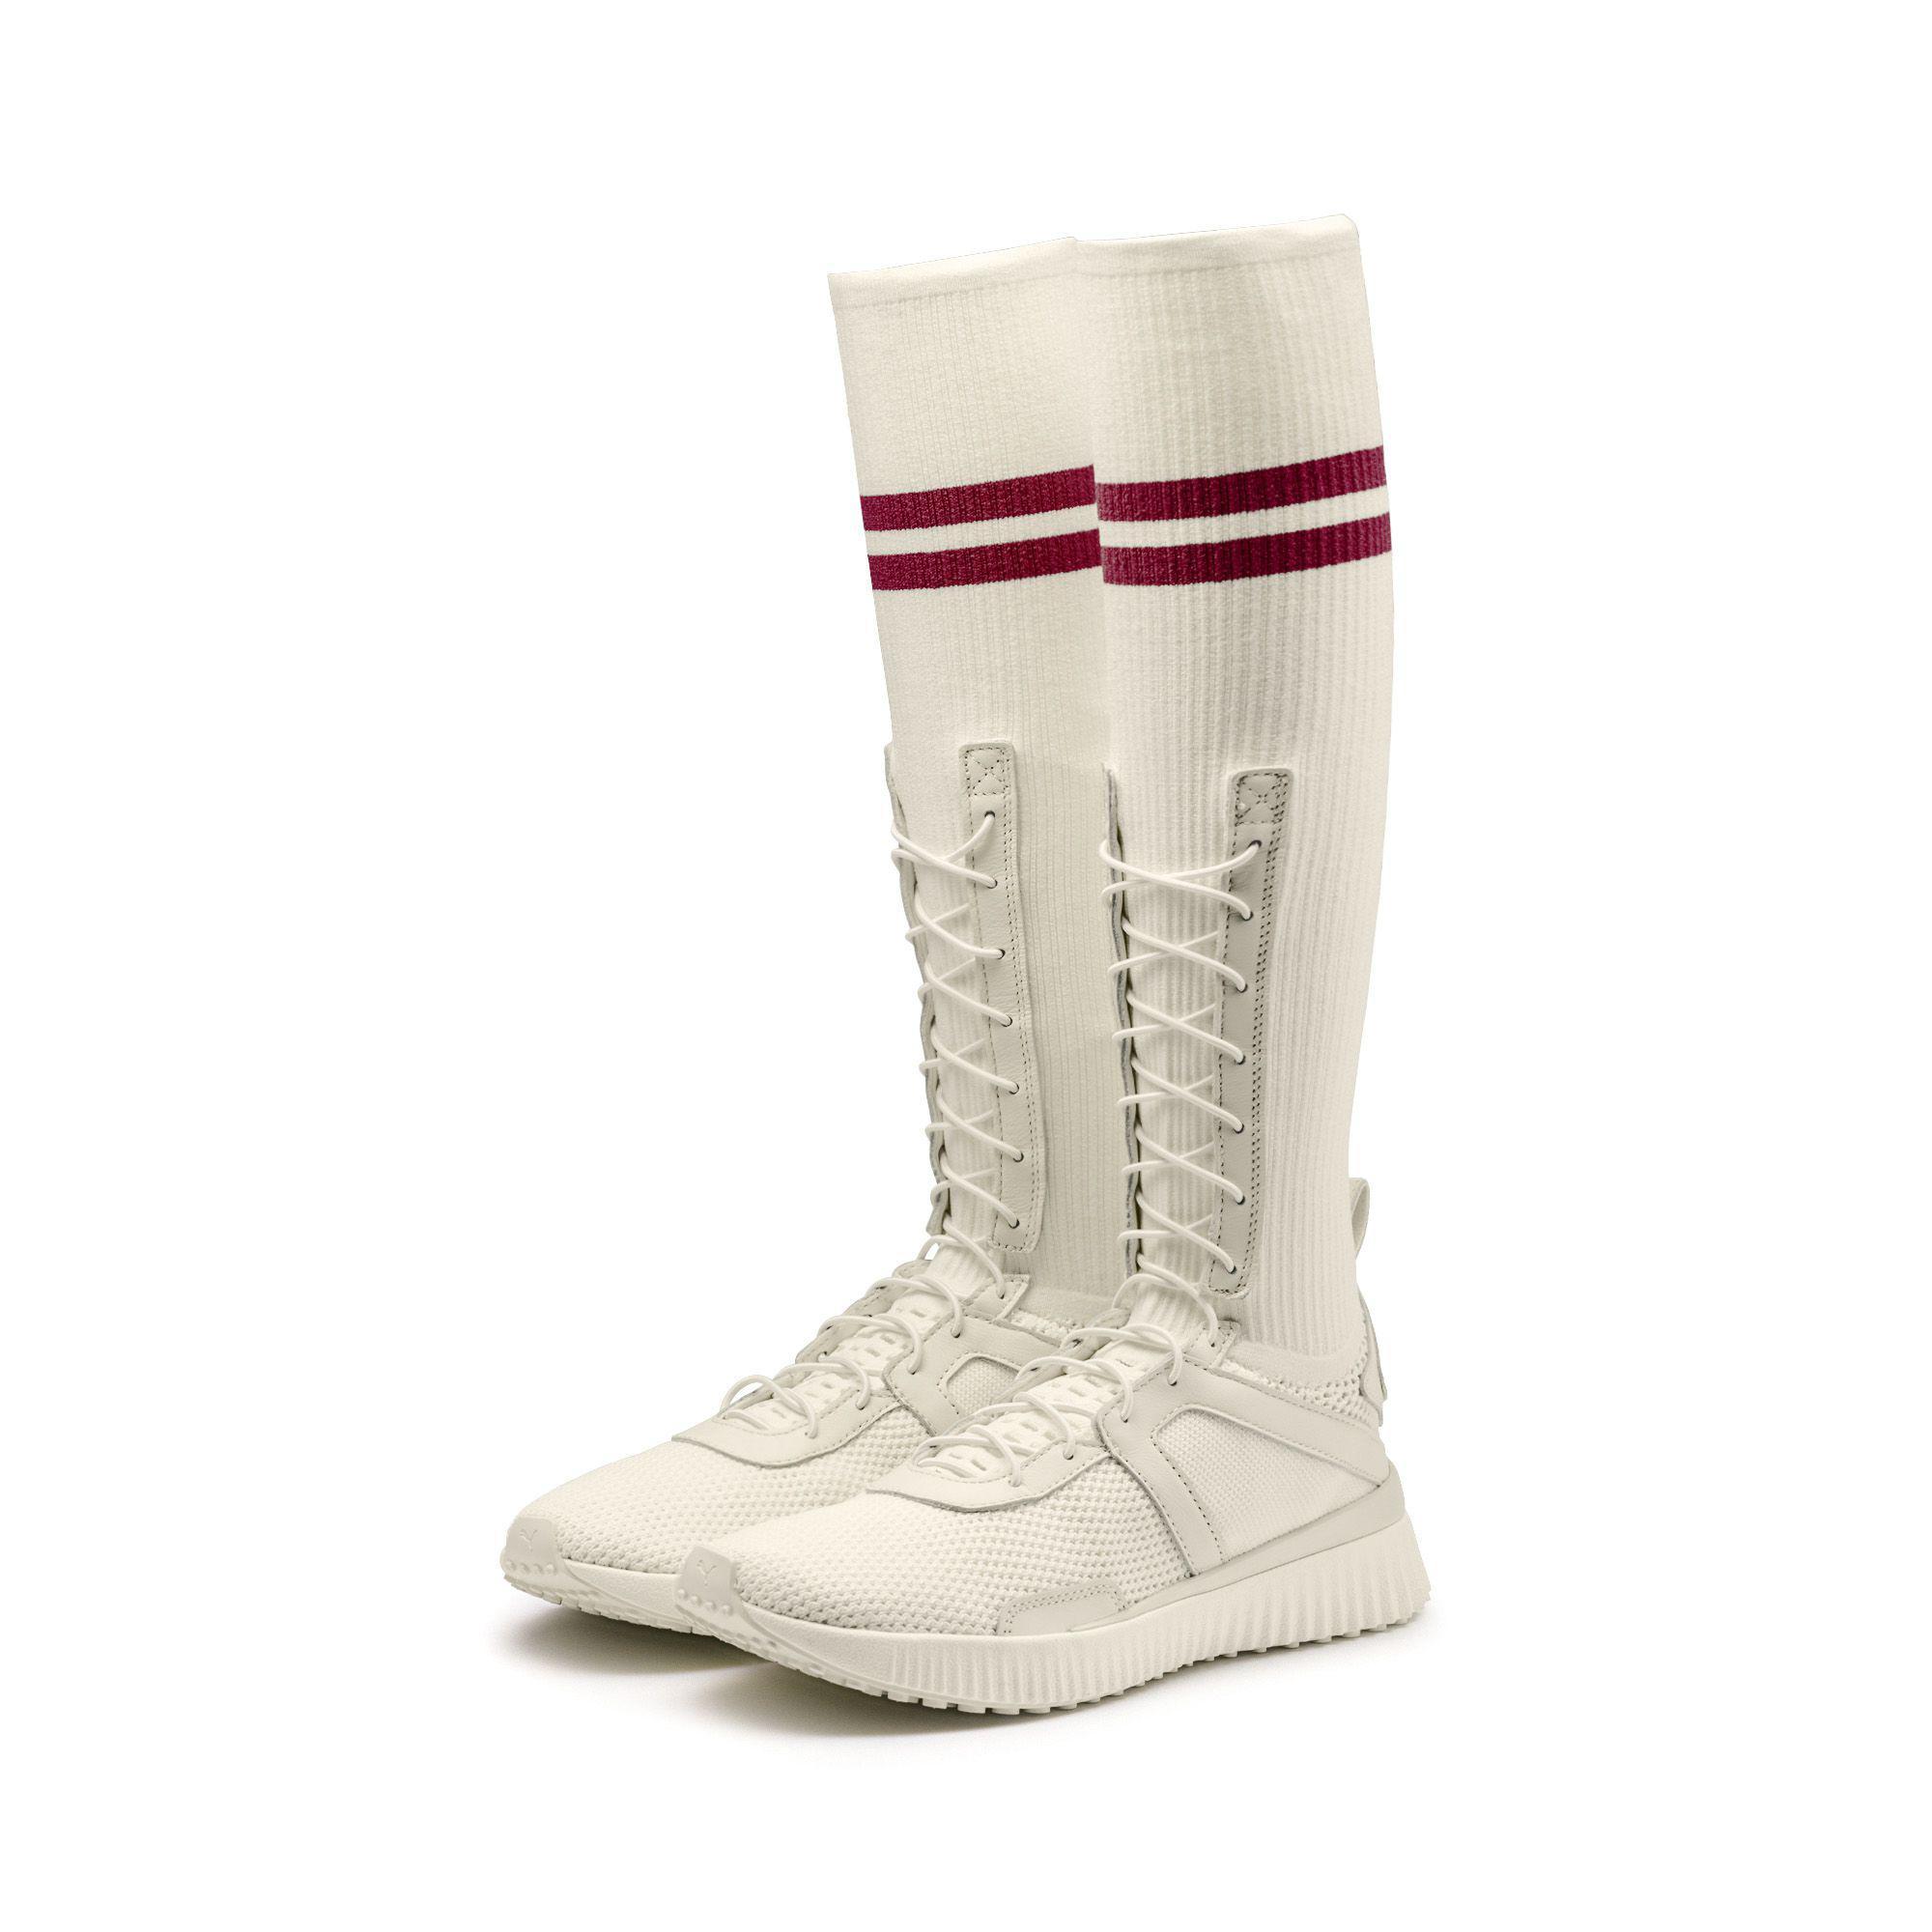 Lyst - PUMA Fenty Trainer Hi Sneakers cdc81457b